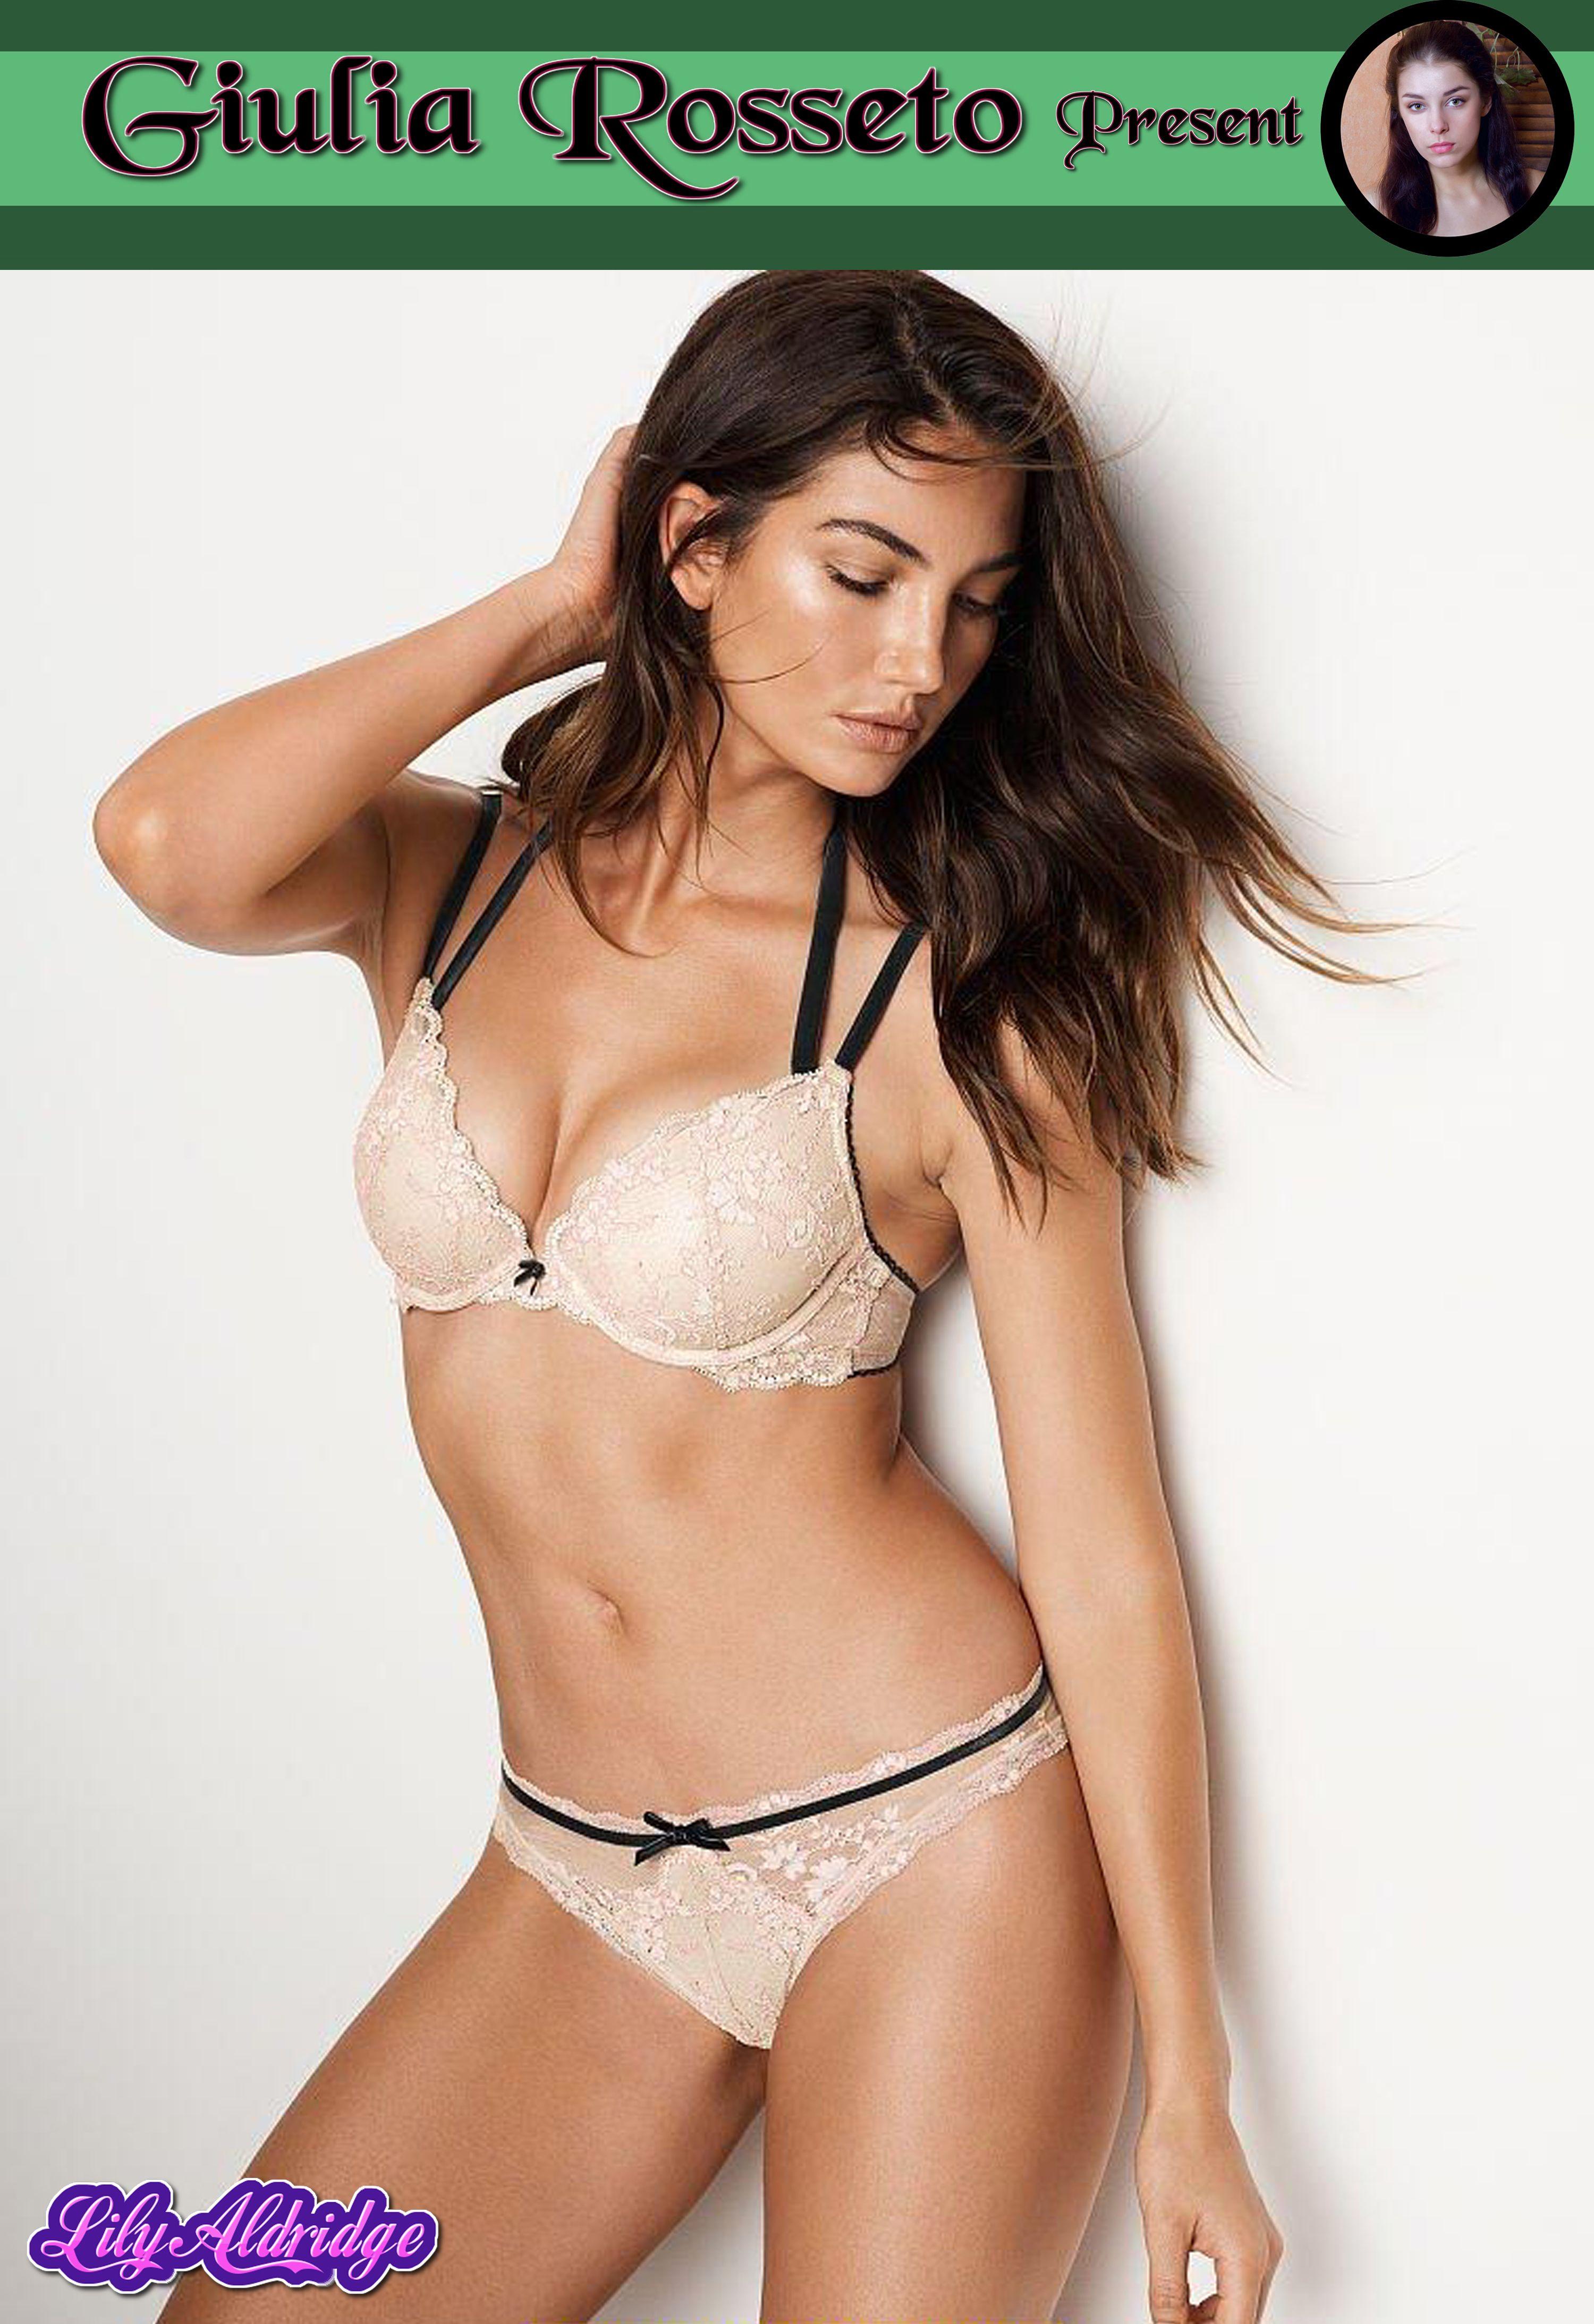 Giulia Rosseto Present Super Models: Lily Aldridge